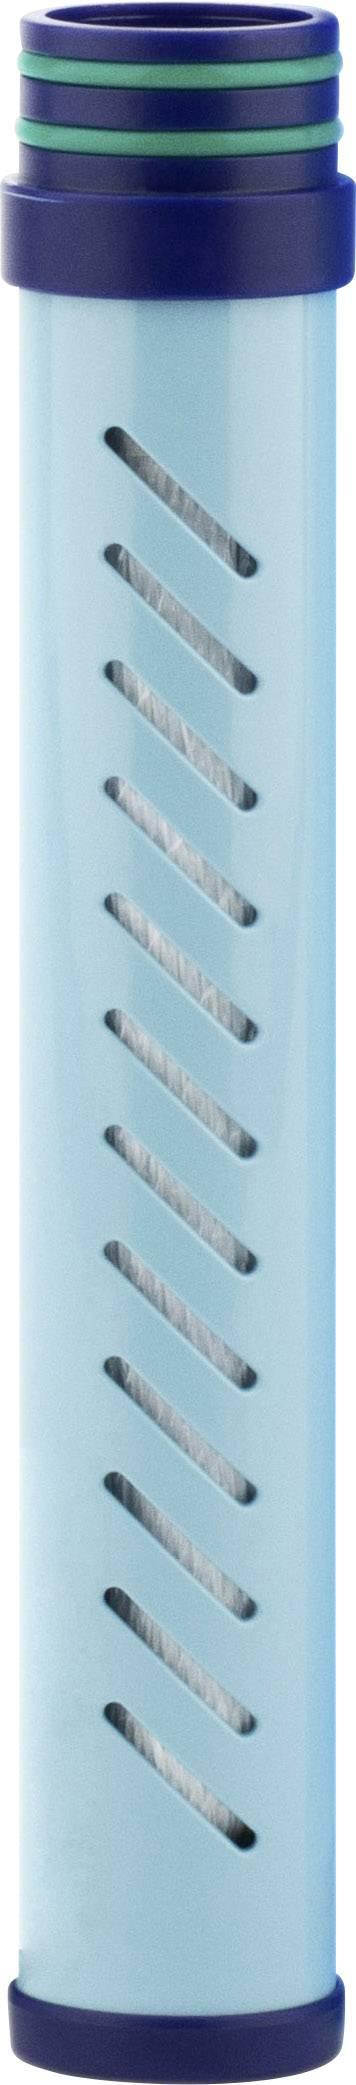 LifeStraw vodní filtr plast 7640144283537 Go 1-Filter